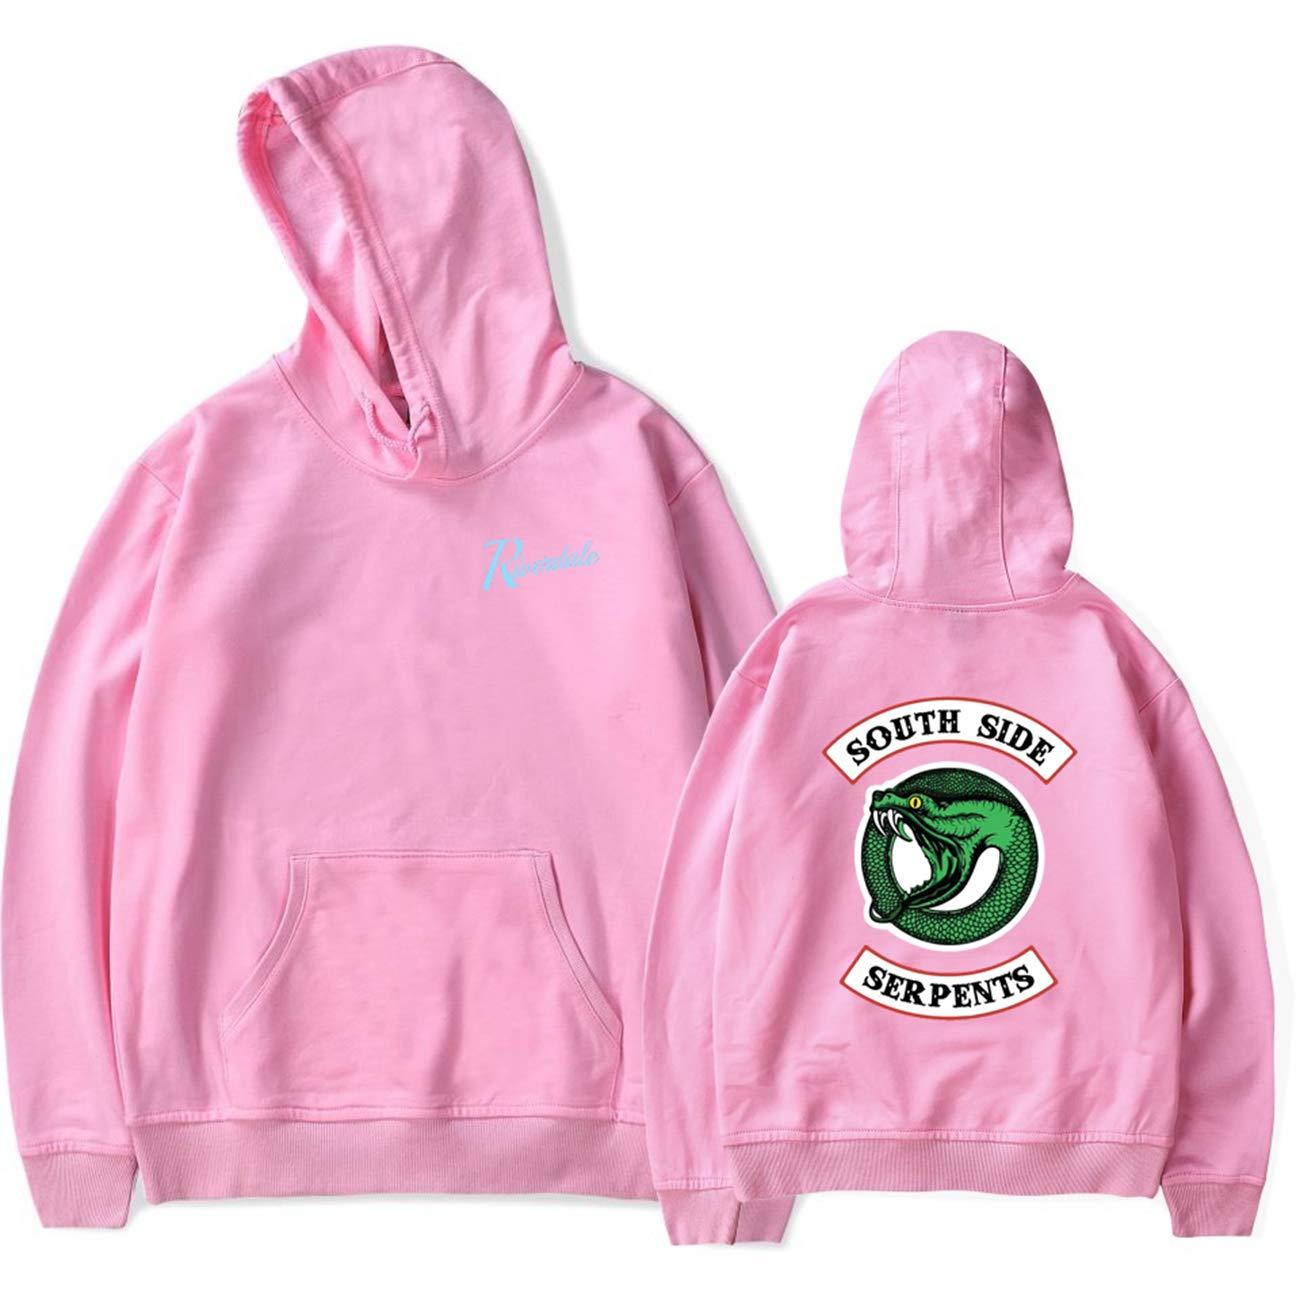 SERAPHY Unisex Hoodie Riverdale Pullover Southside Serpents Sweatshirt Pink L